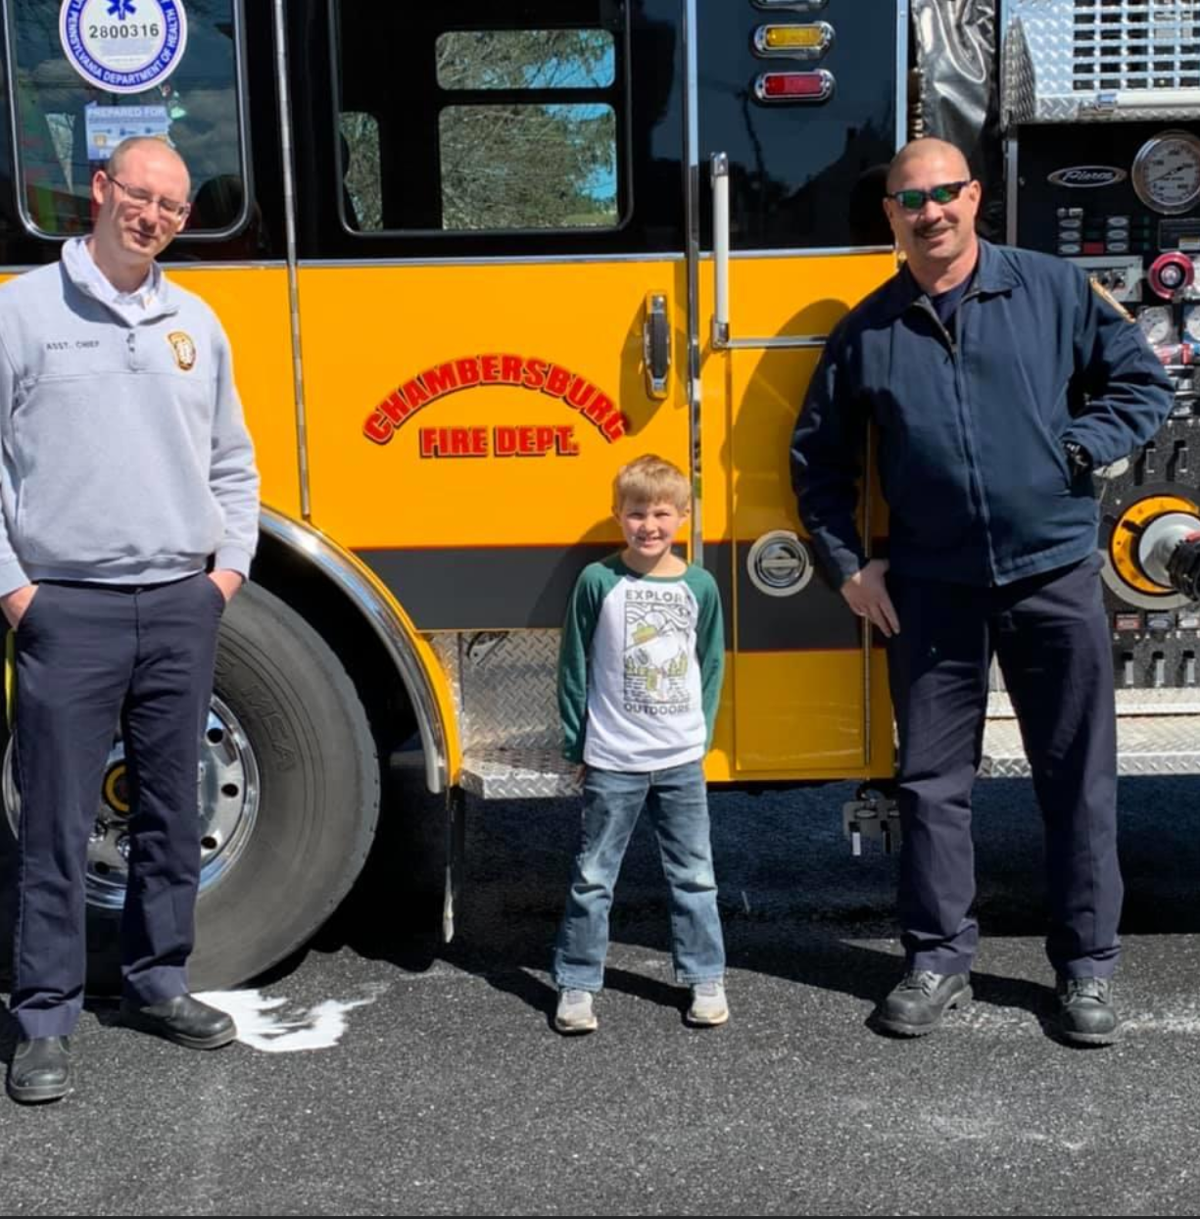 Chambersburg Fire Department